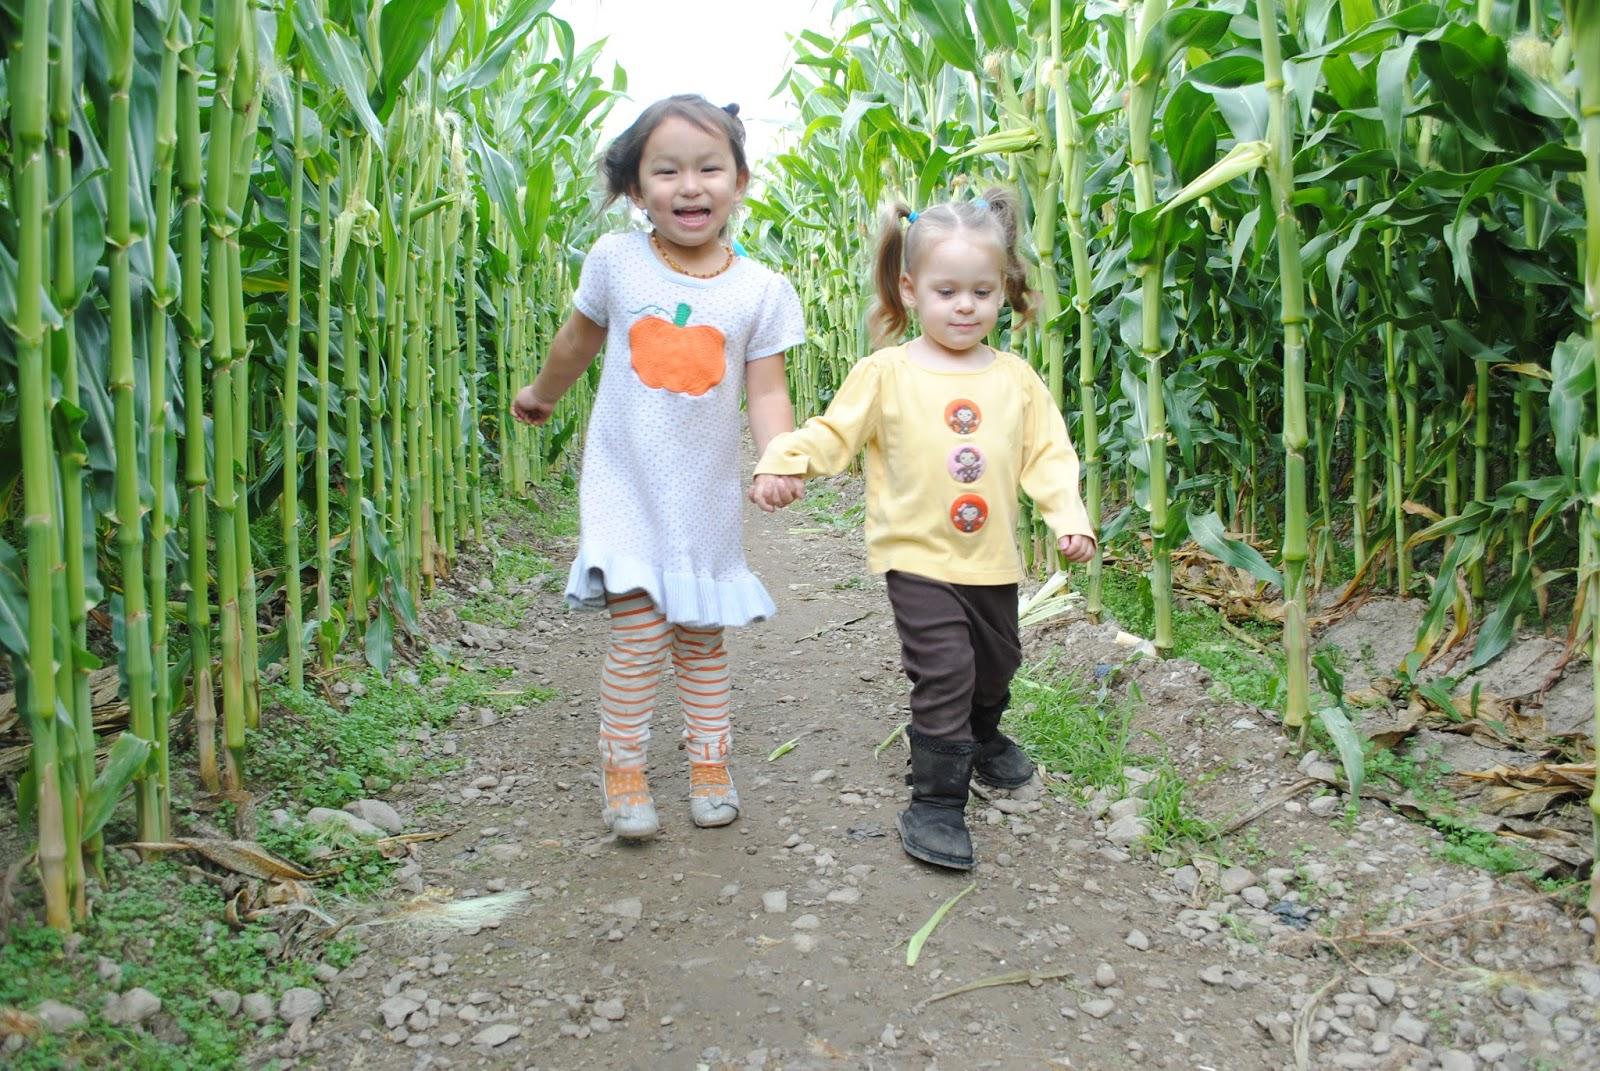 Pheasant Fields Farm - Medford - Phoenix - Fall - Corn Maze - What to do in Southern Oregon